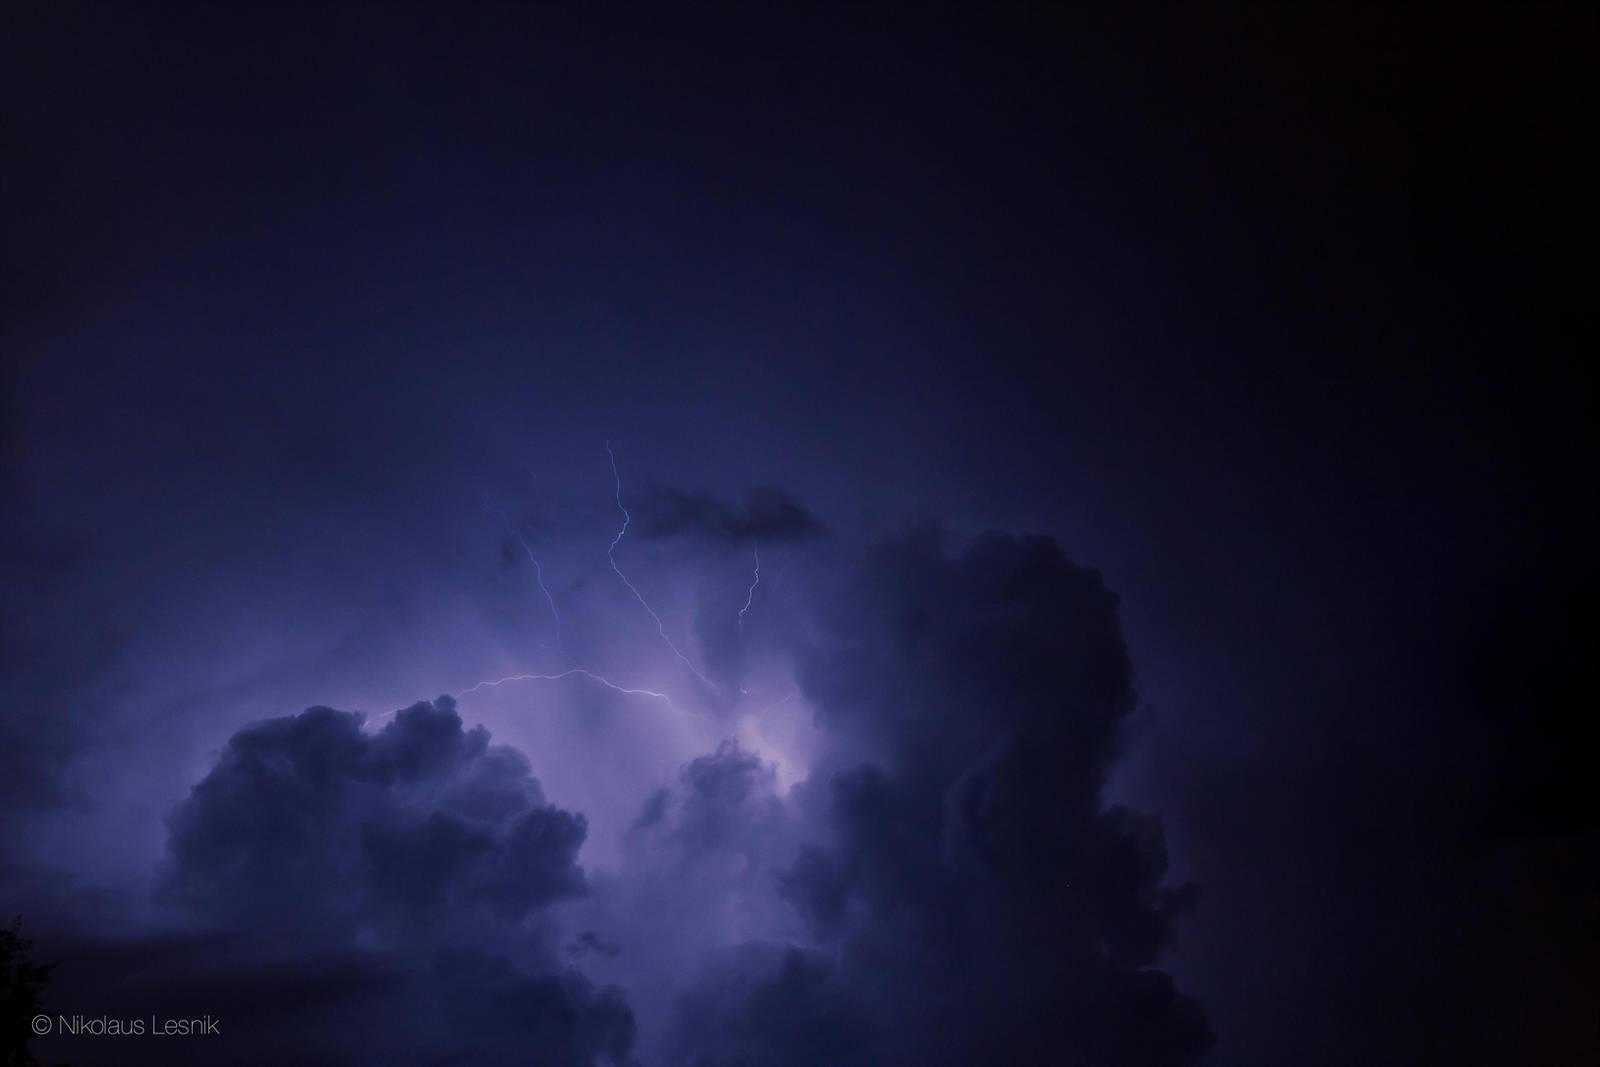 Thundercloud by N1cn4c